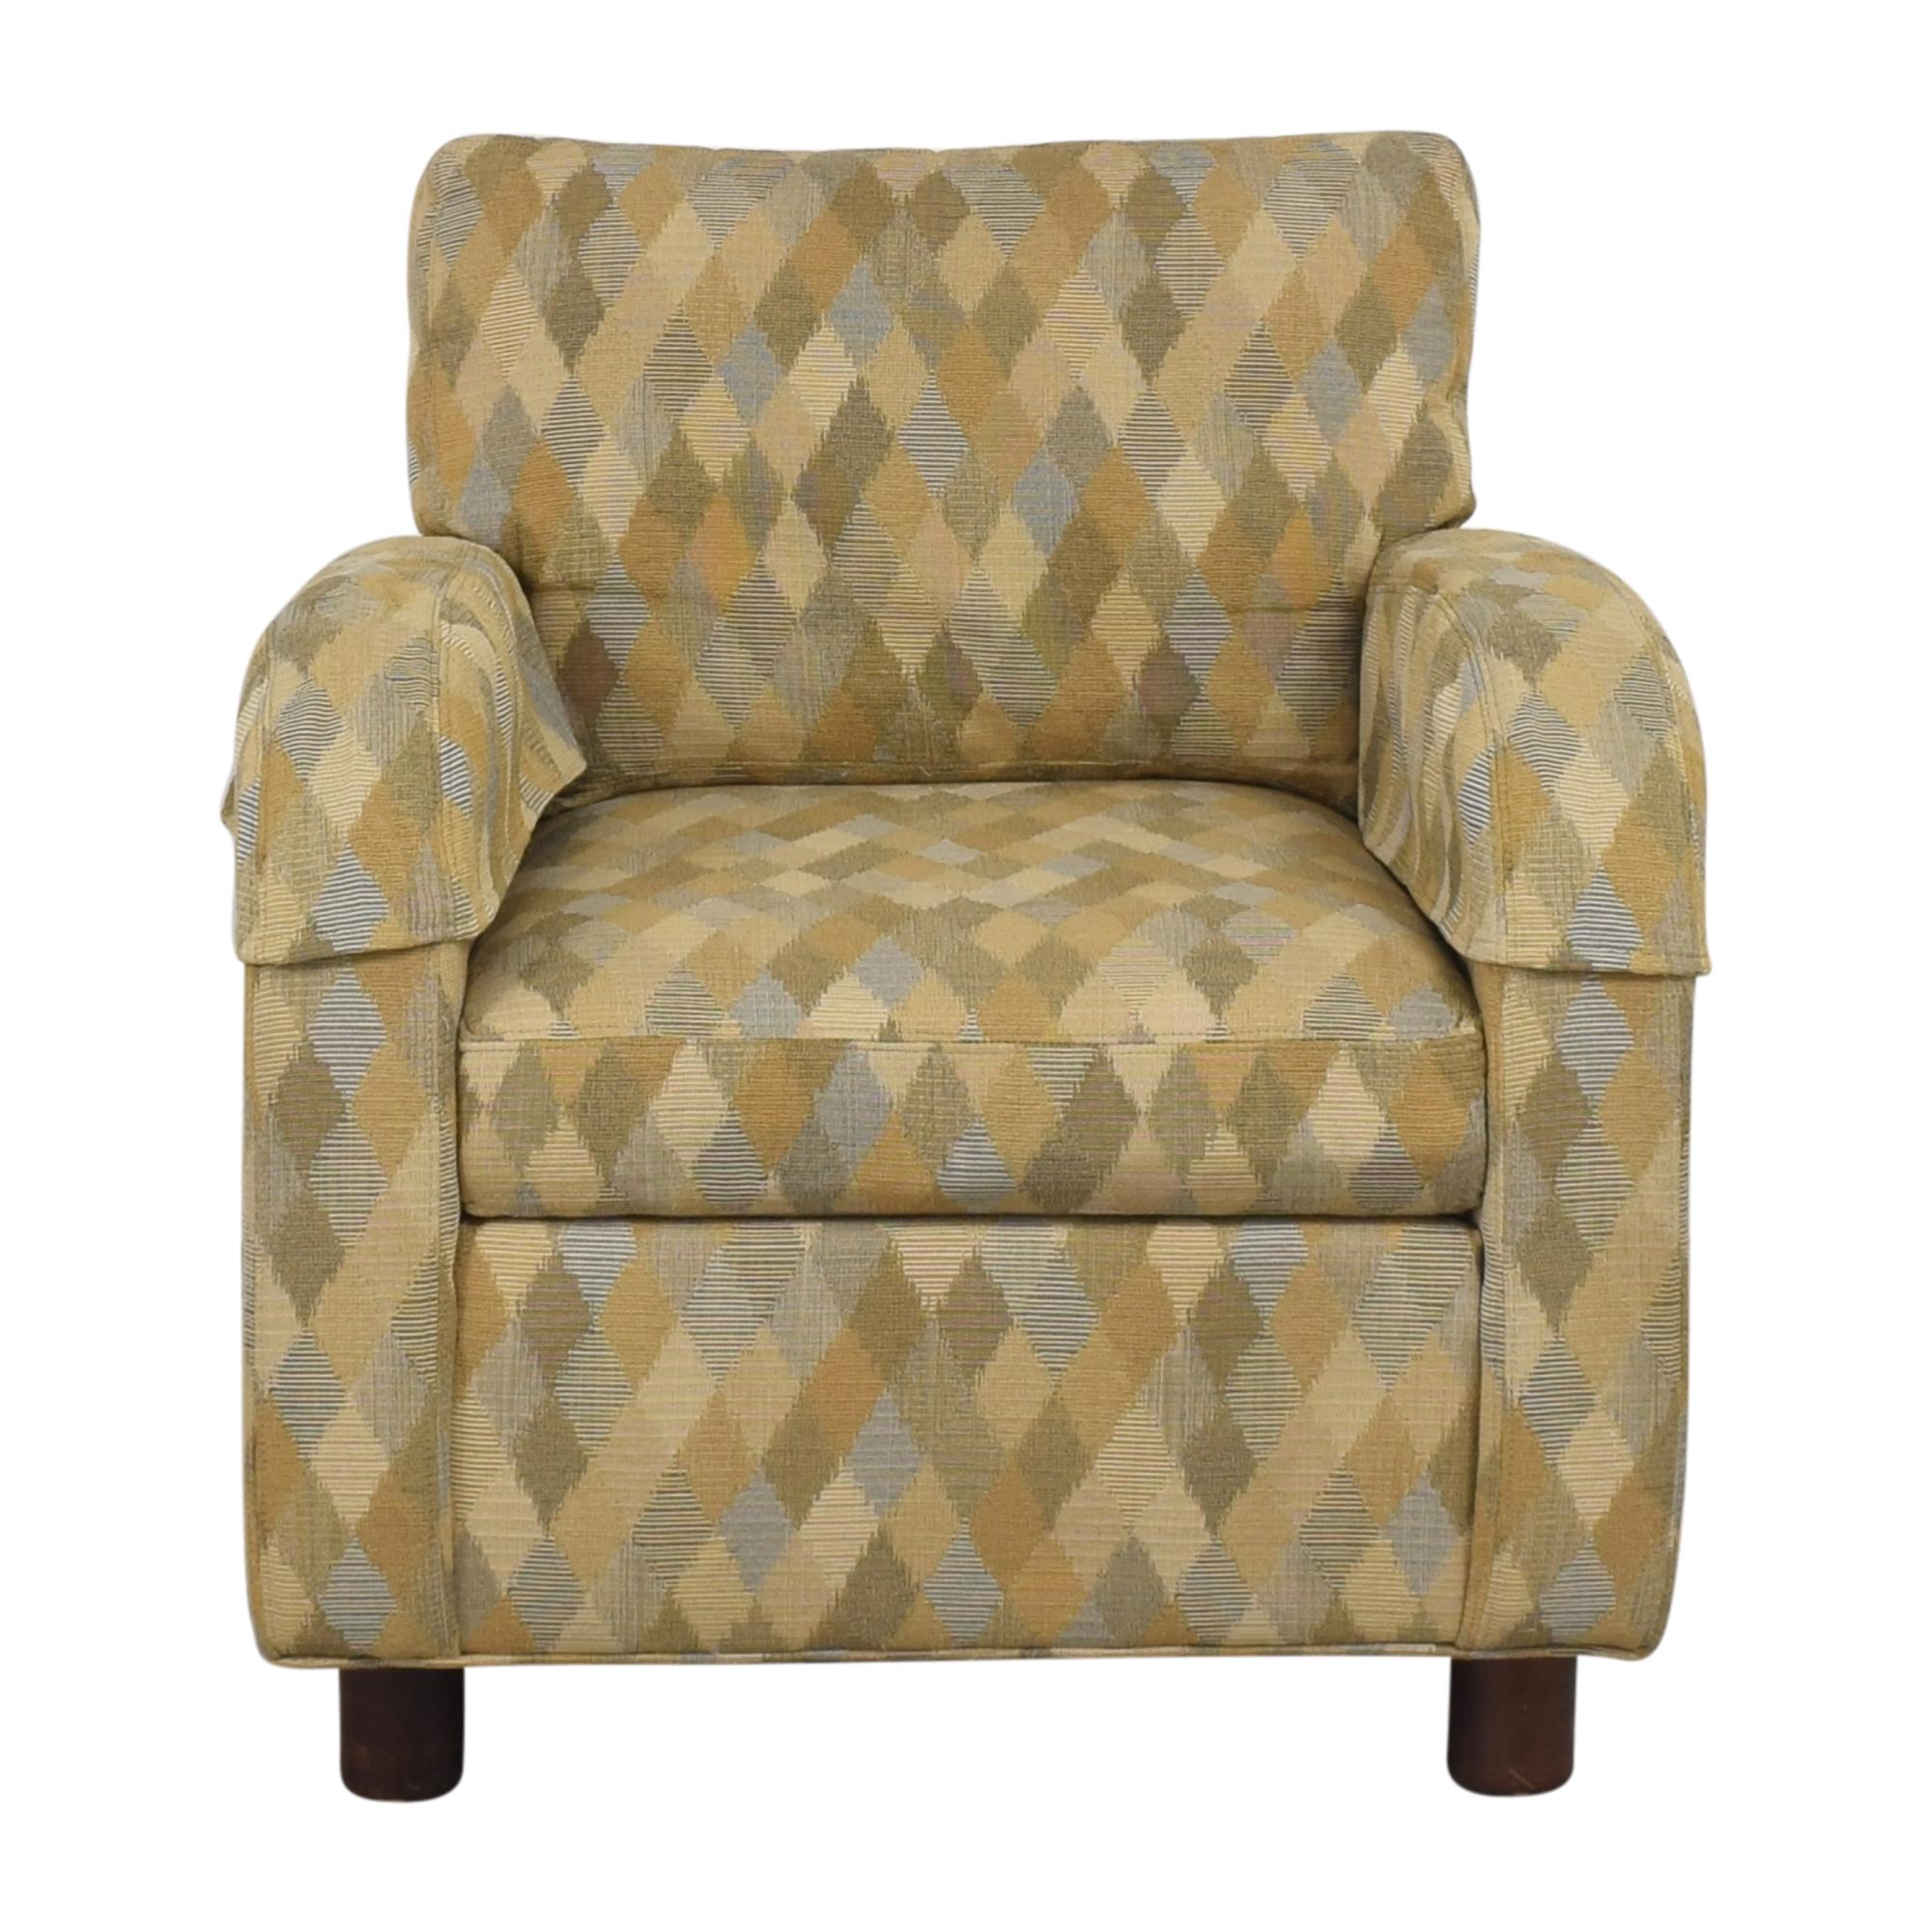 Ethan Allen Accent Chair sale